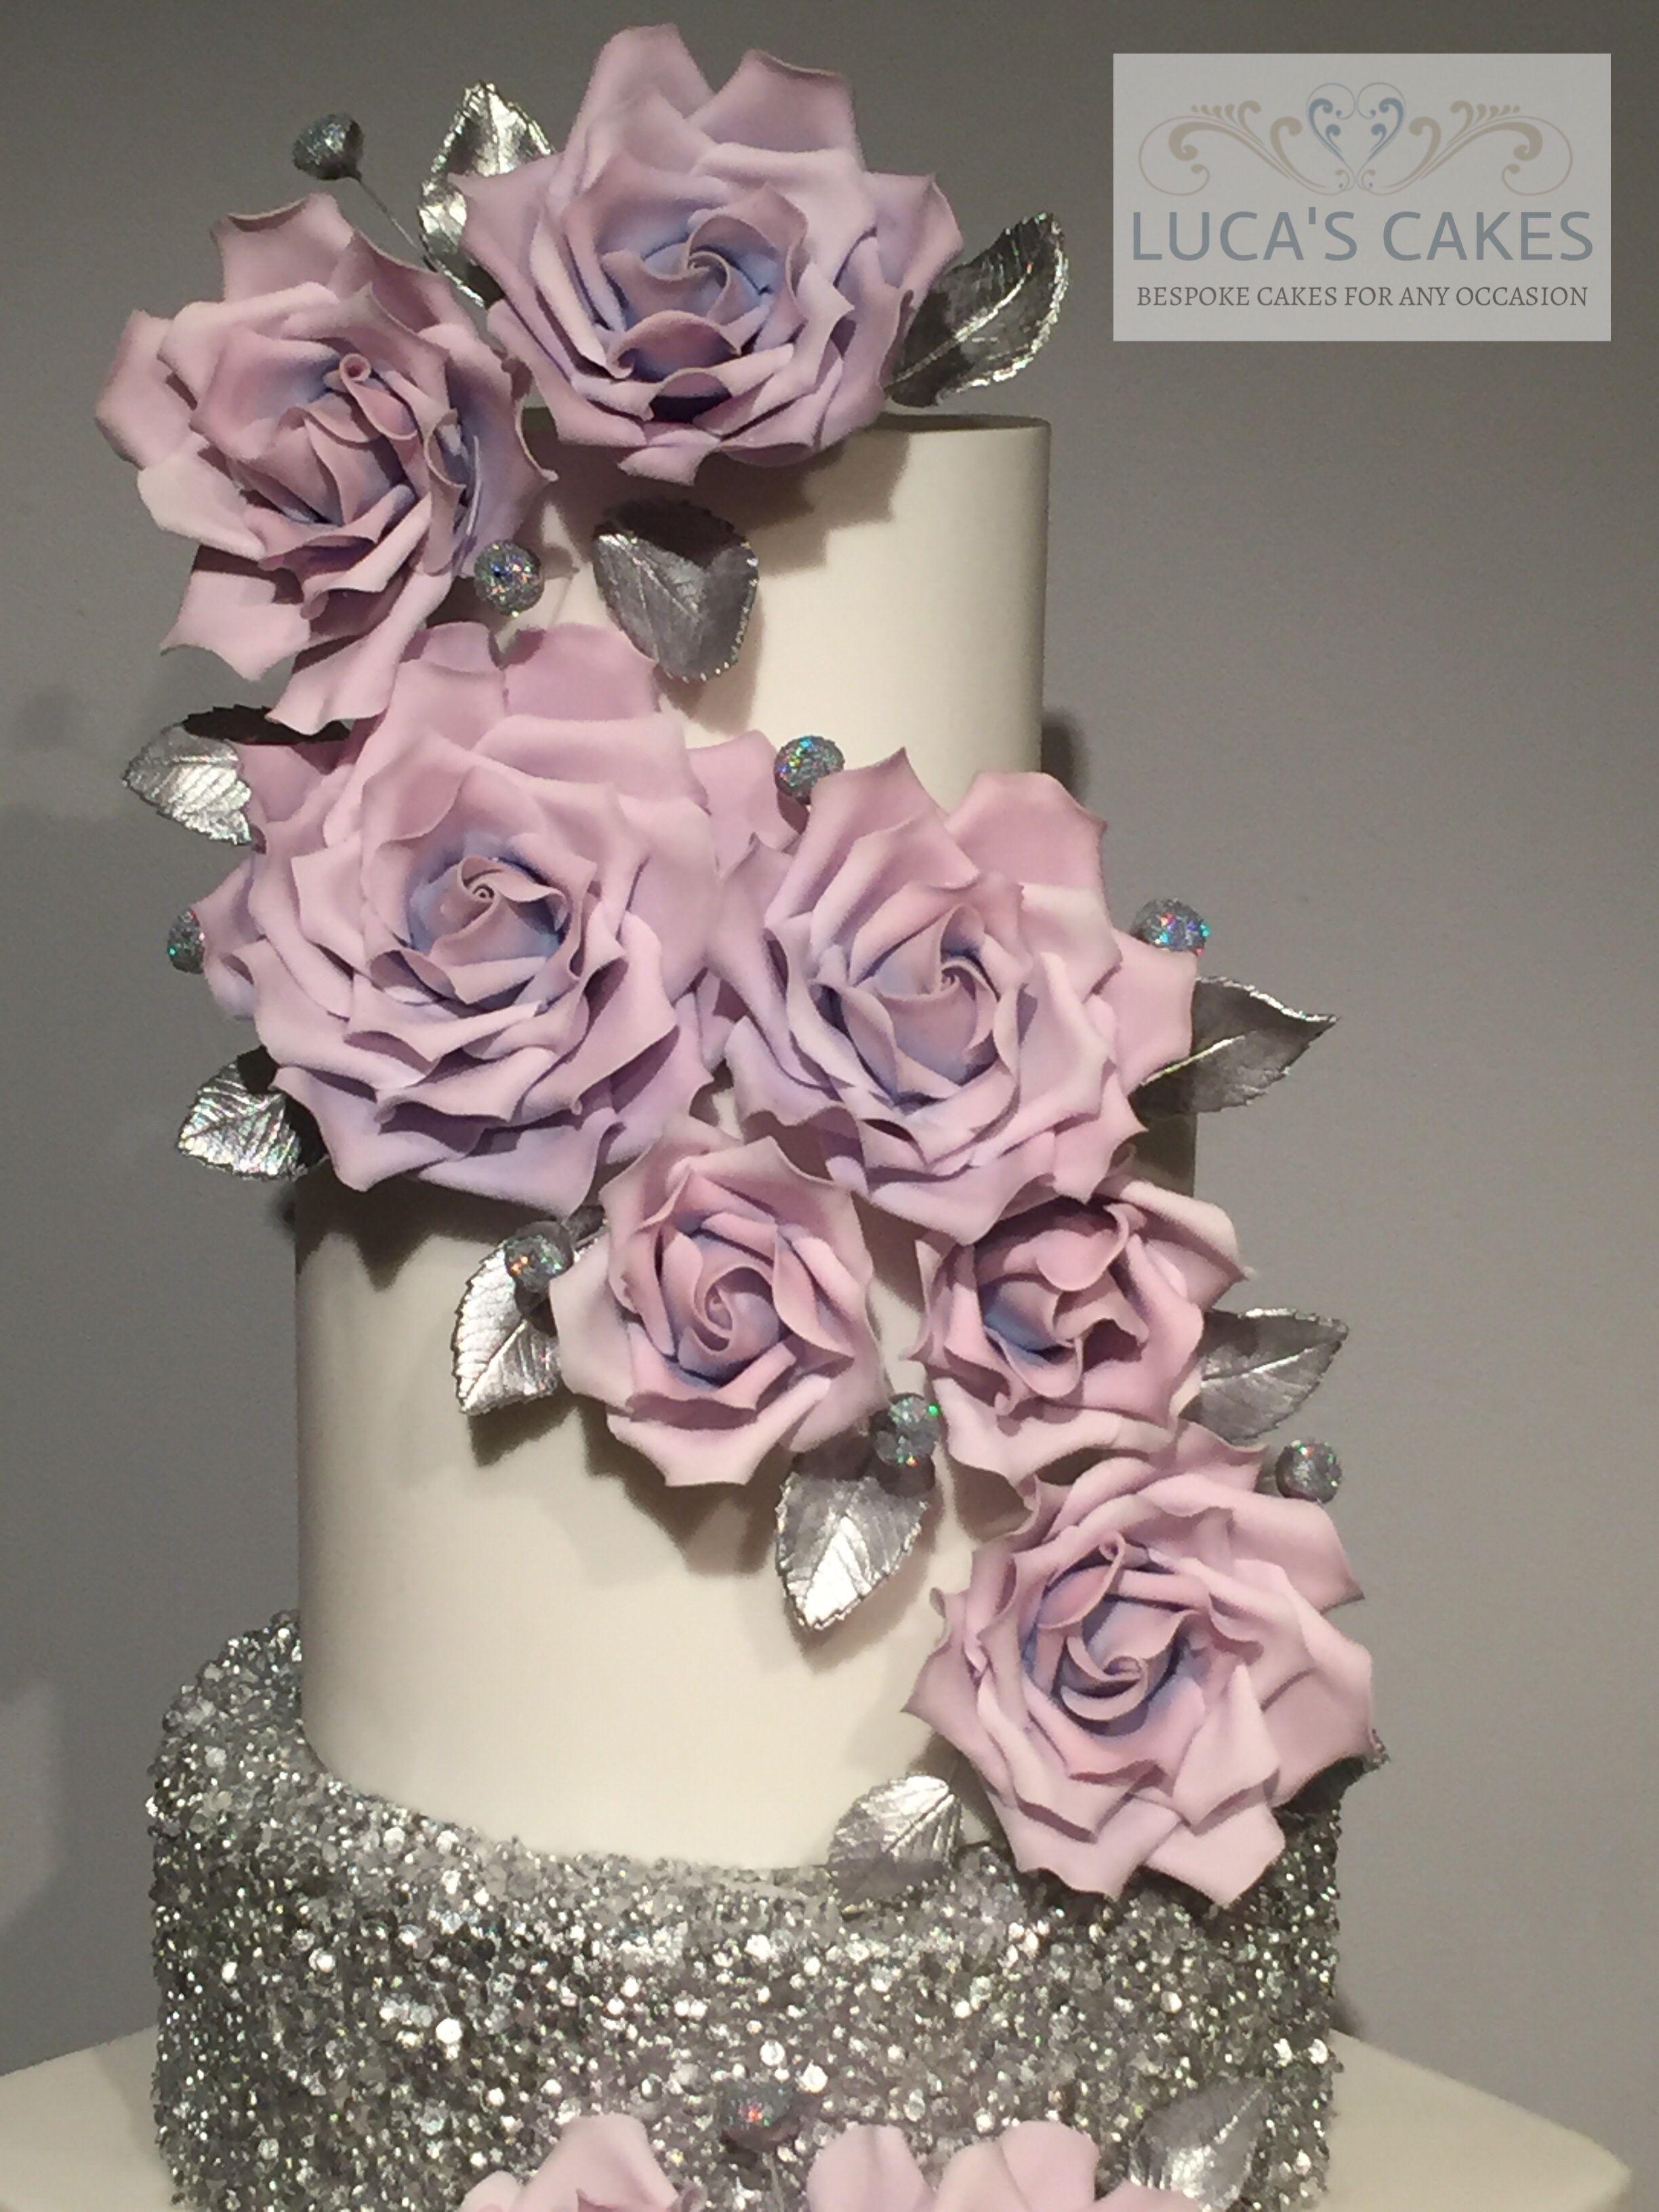 Pin by lucaus cakes on wedding cakes pinterest wedding cake